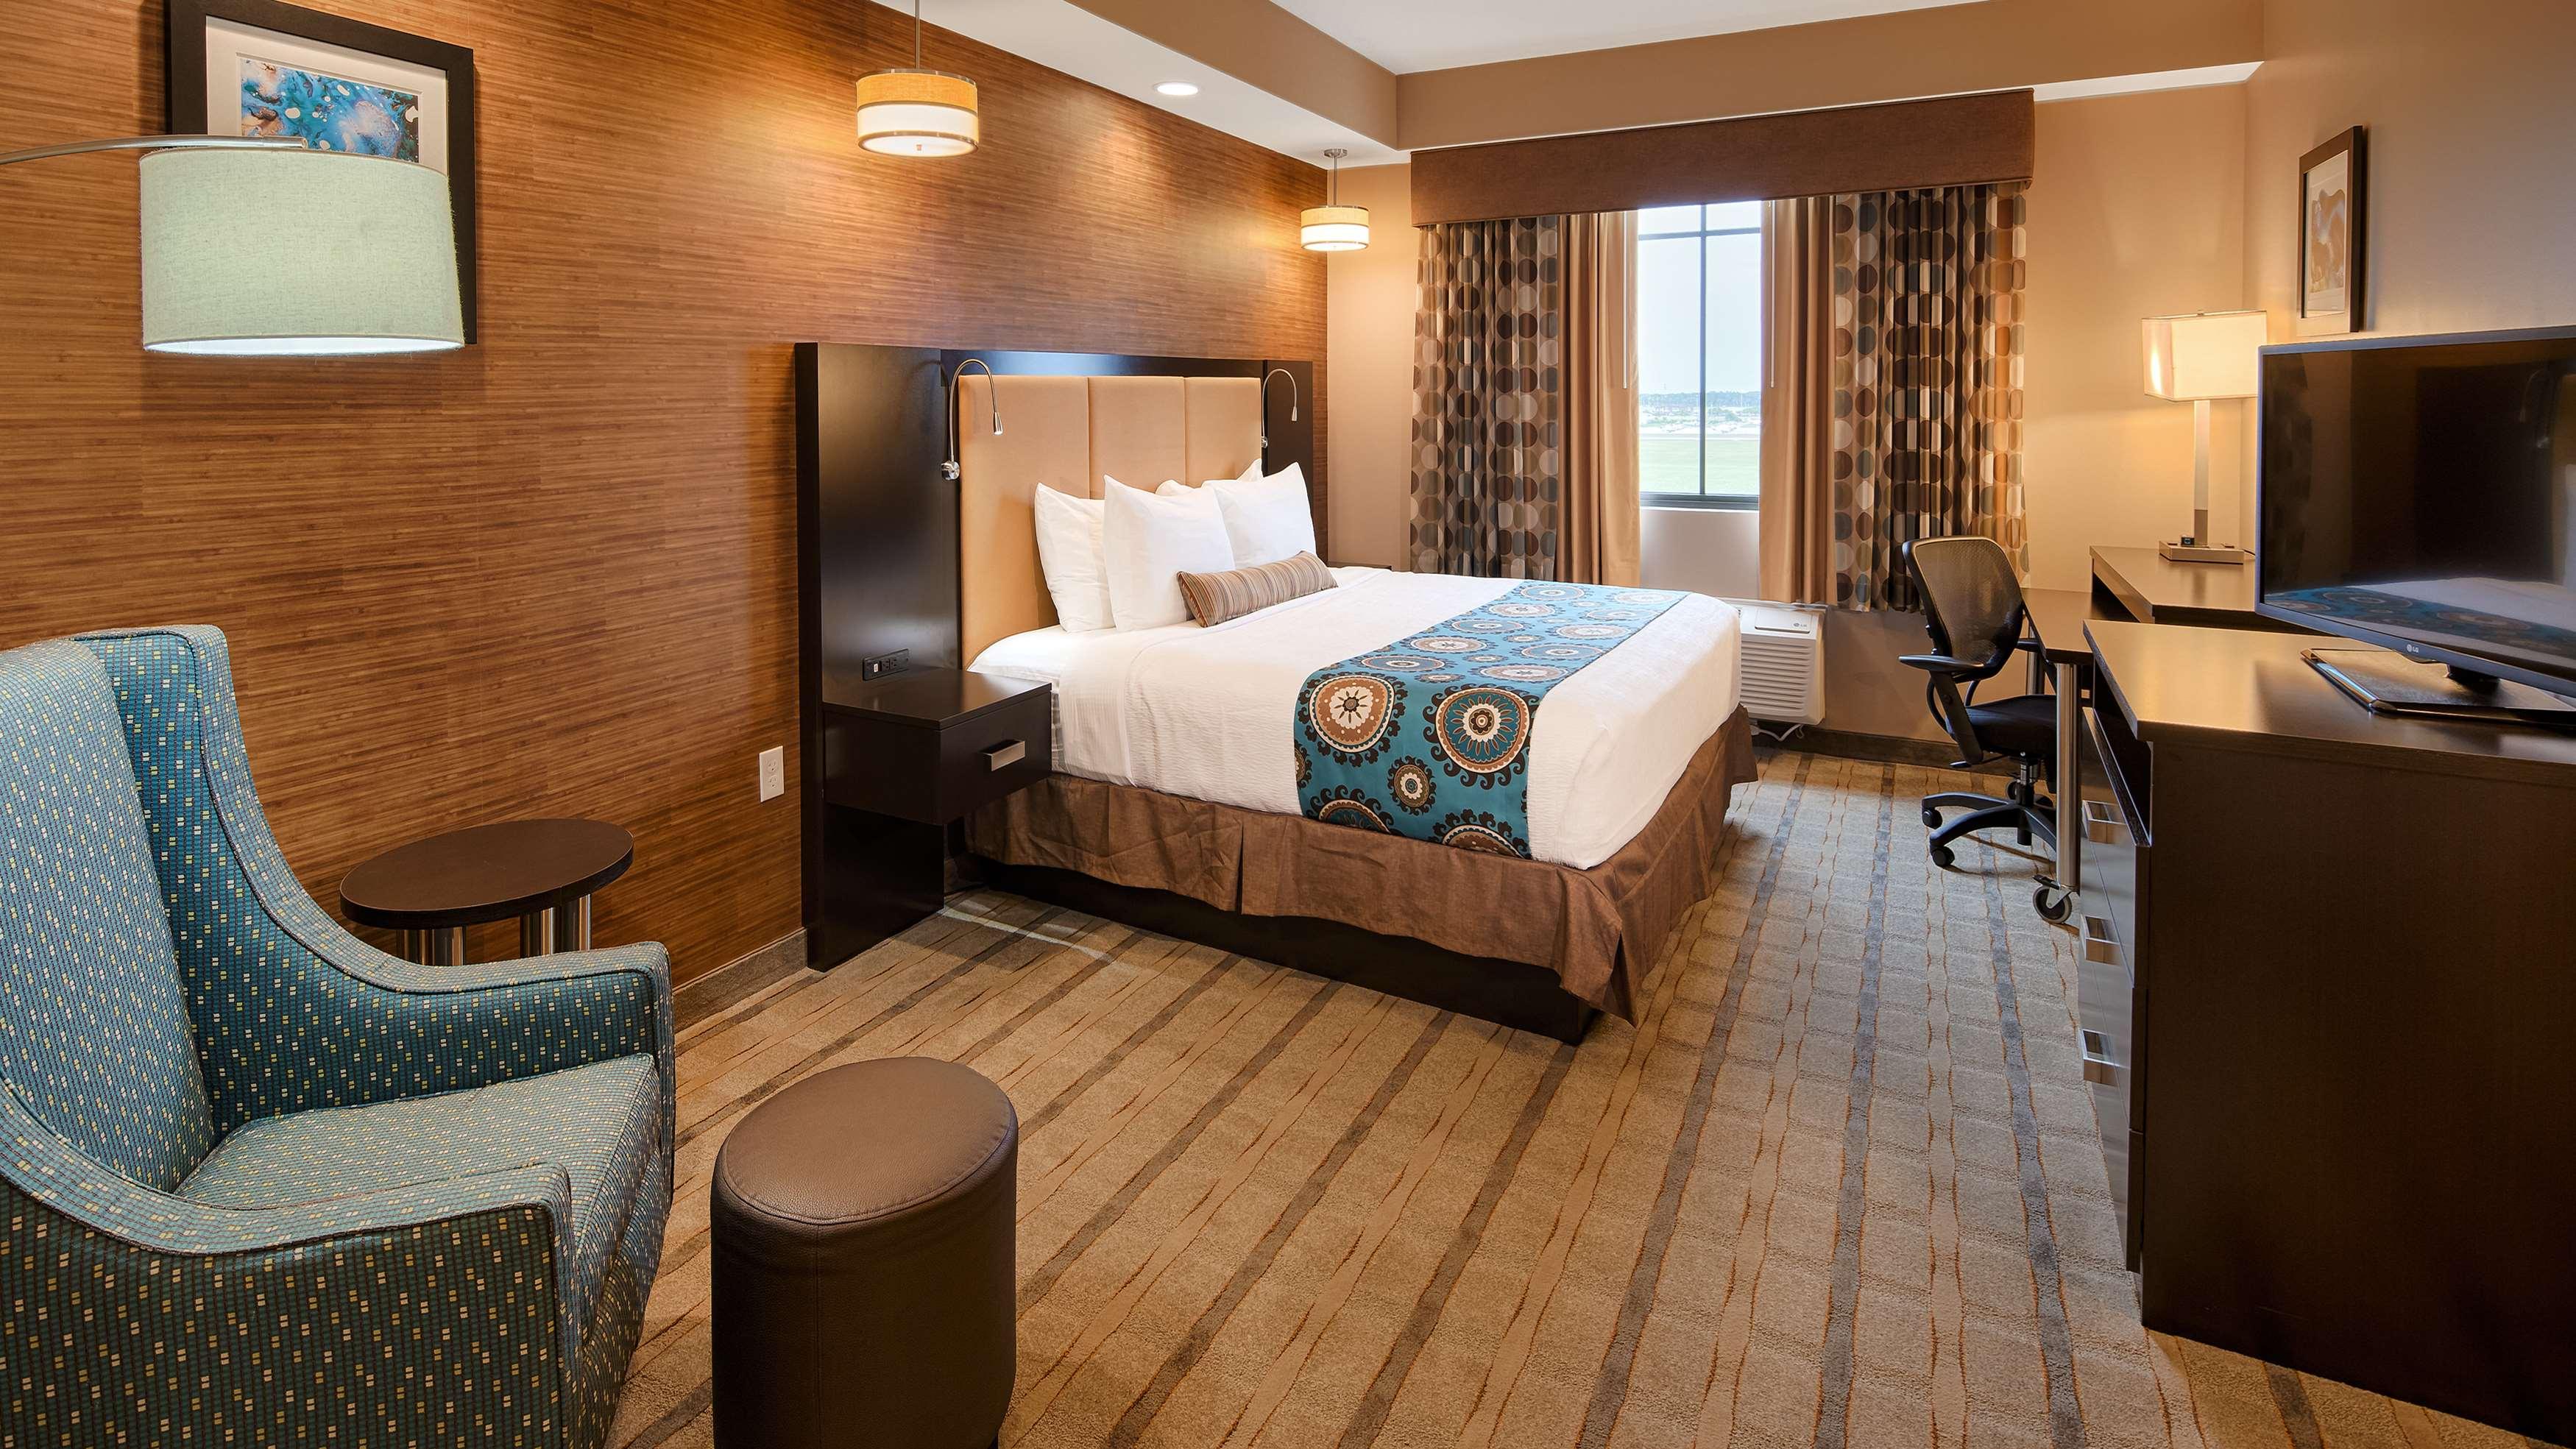 Best Western Plus Kendall Airport Hotel & Suites image 20